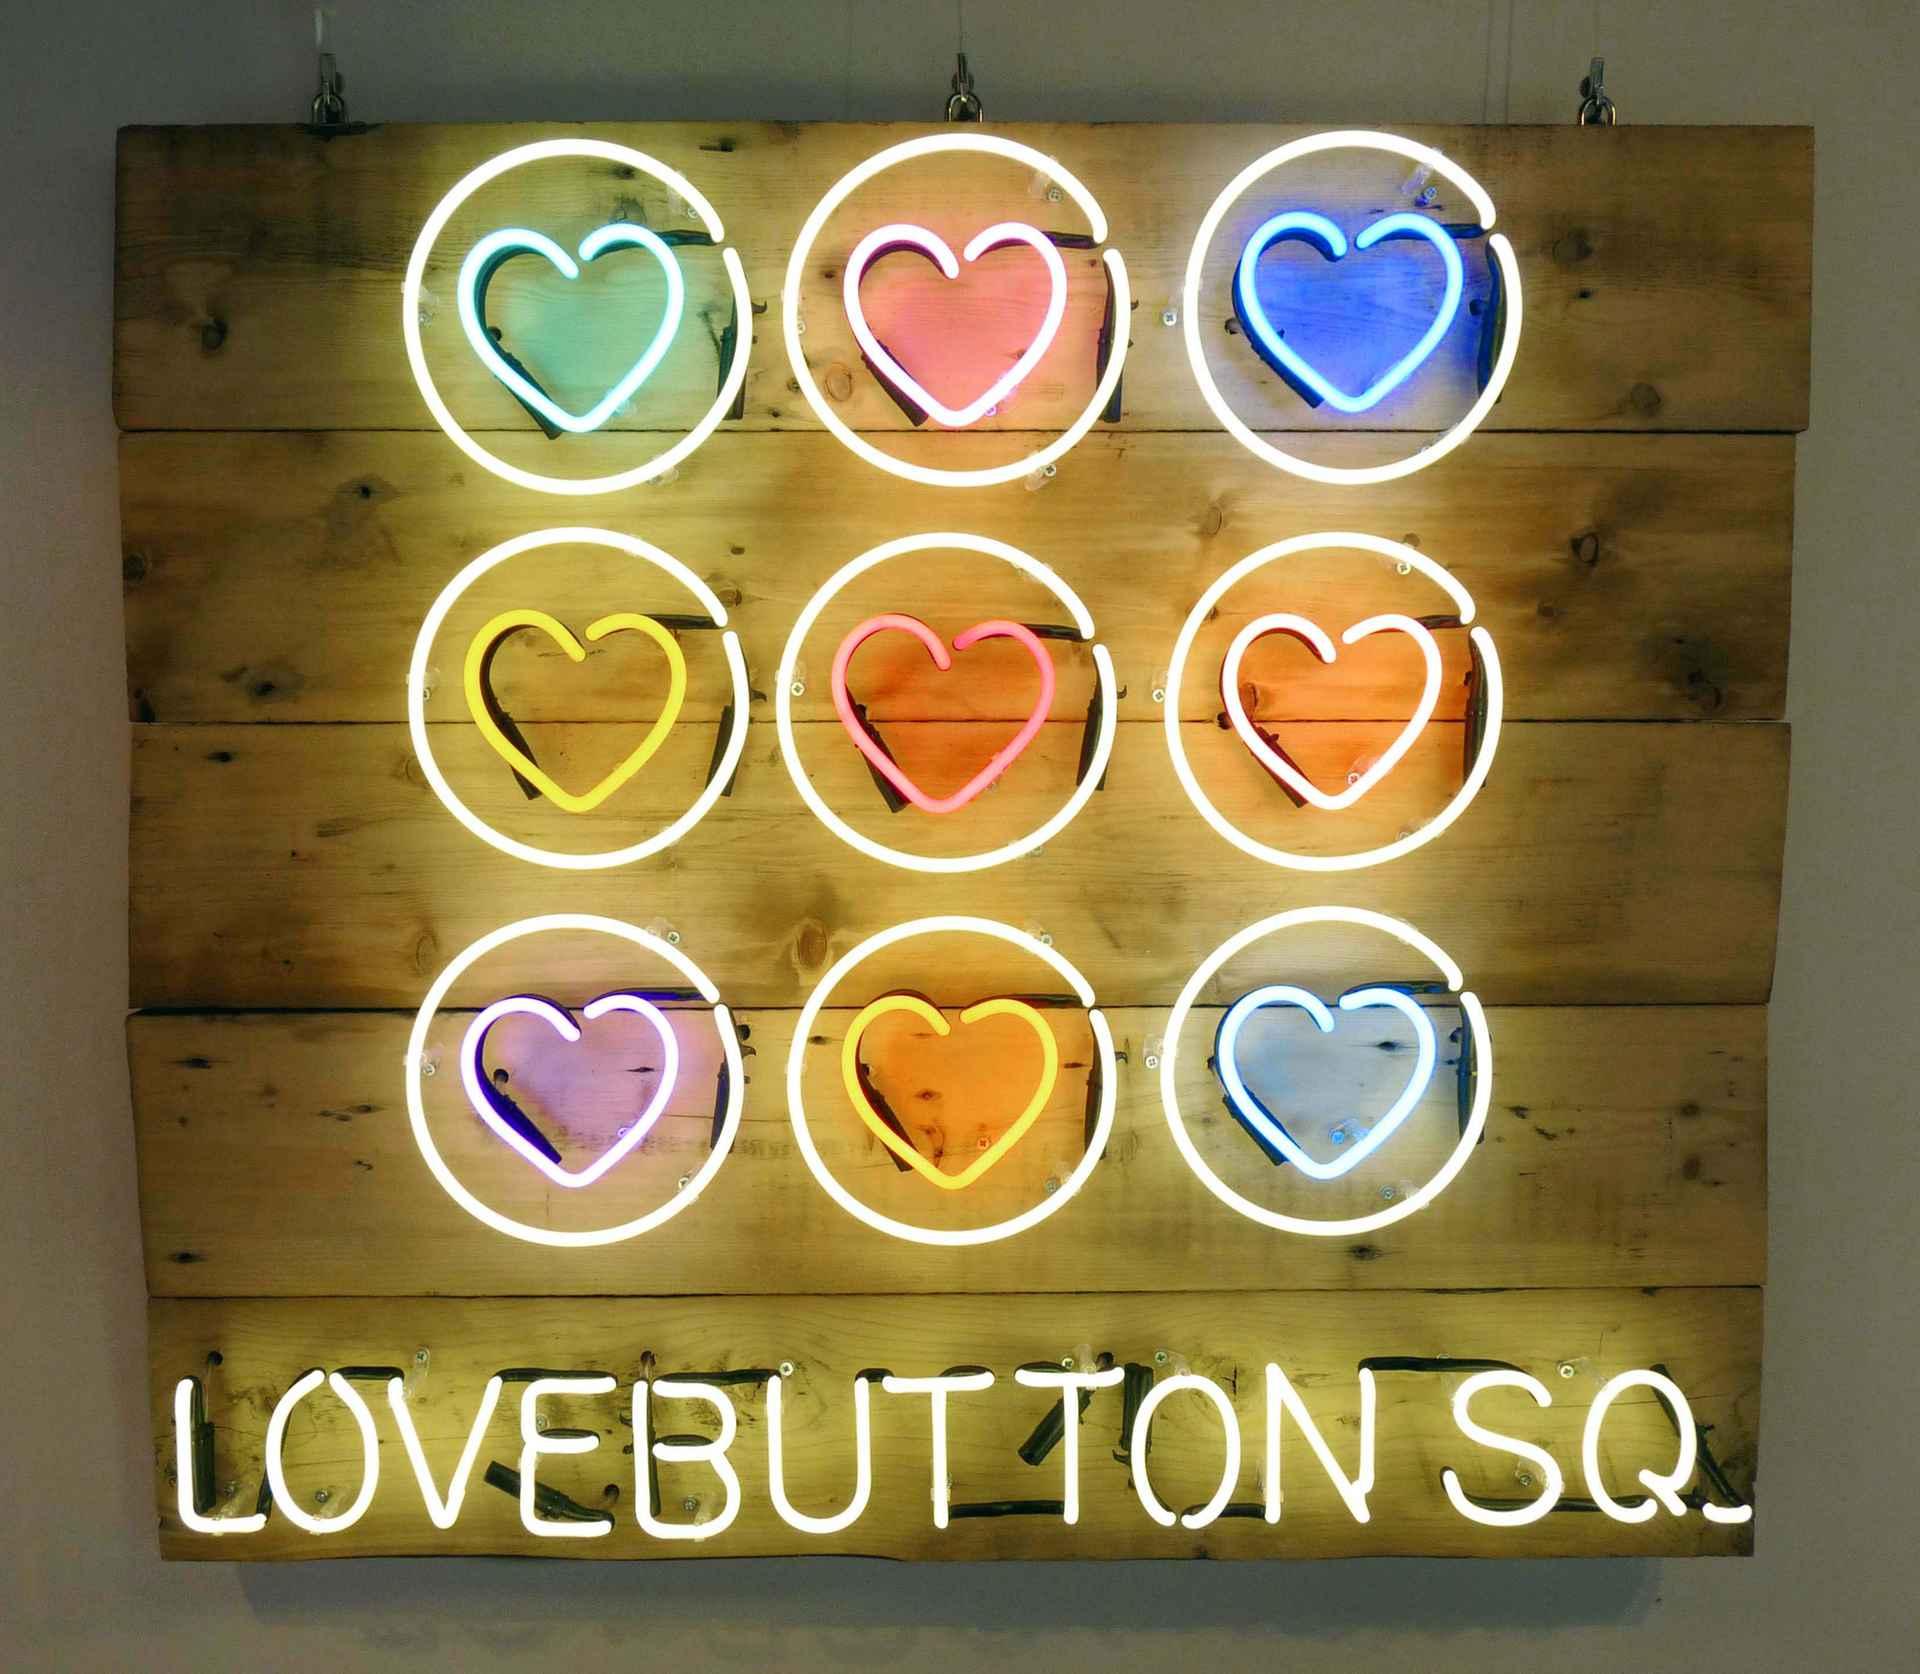 Love Button Sq by Stephen Farley